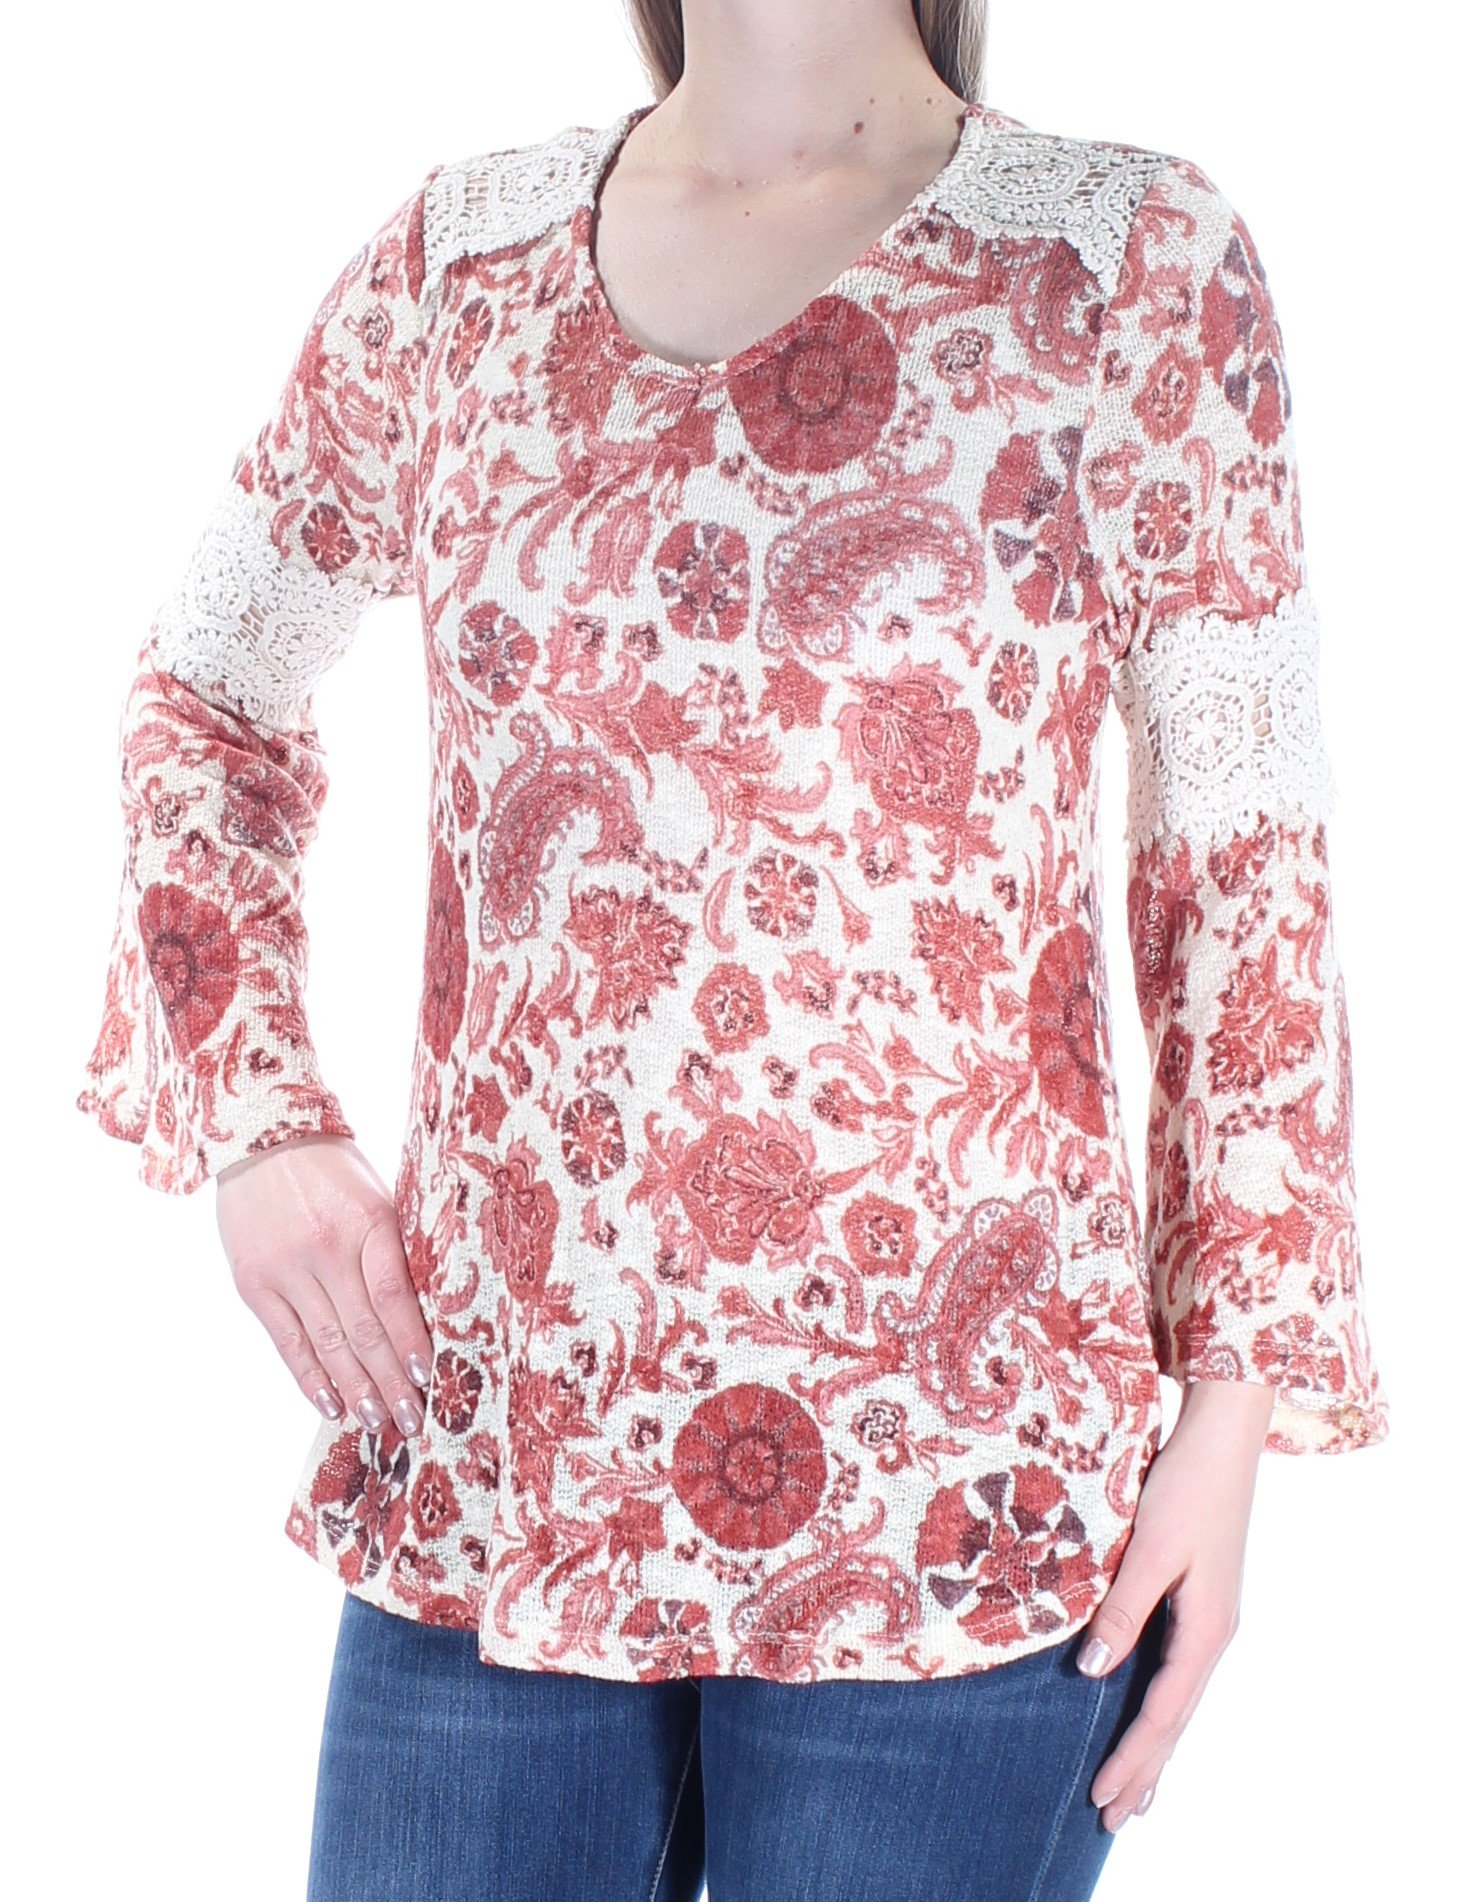 Style & Co. Petite Printed Crochet-Trim Top. Rich Auburn Cmb. P/M